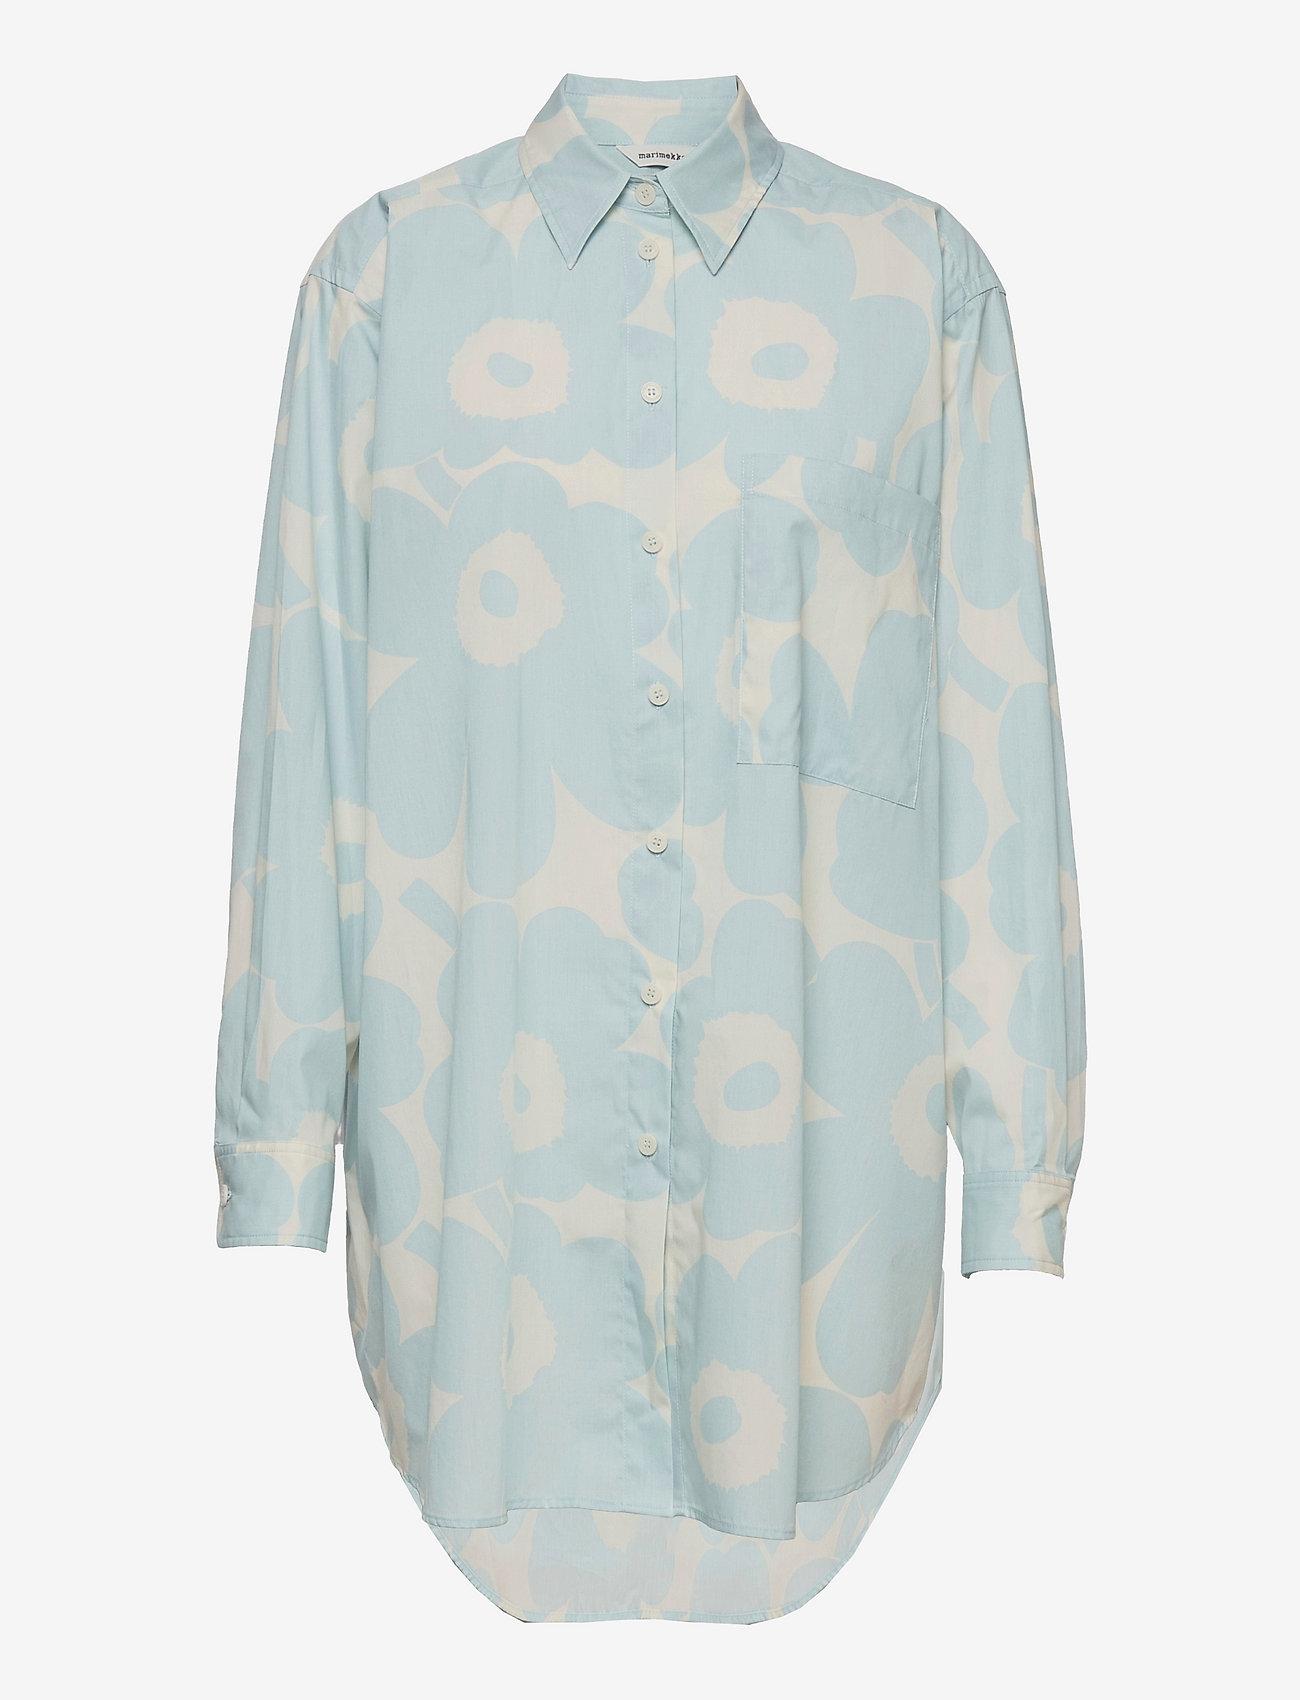 Marimekko - NORKKO PIENI UNIKKO 2 SHIRT - langærmede skjorter - off-white, light blue - 0